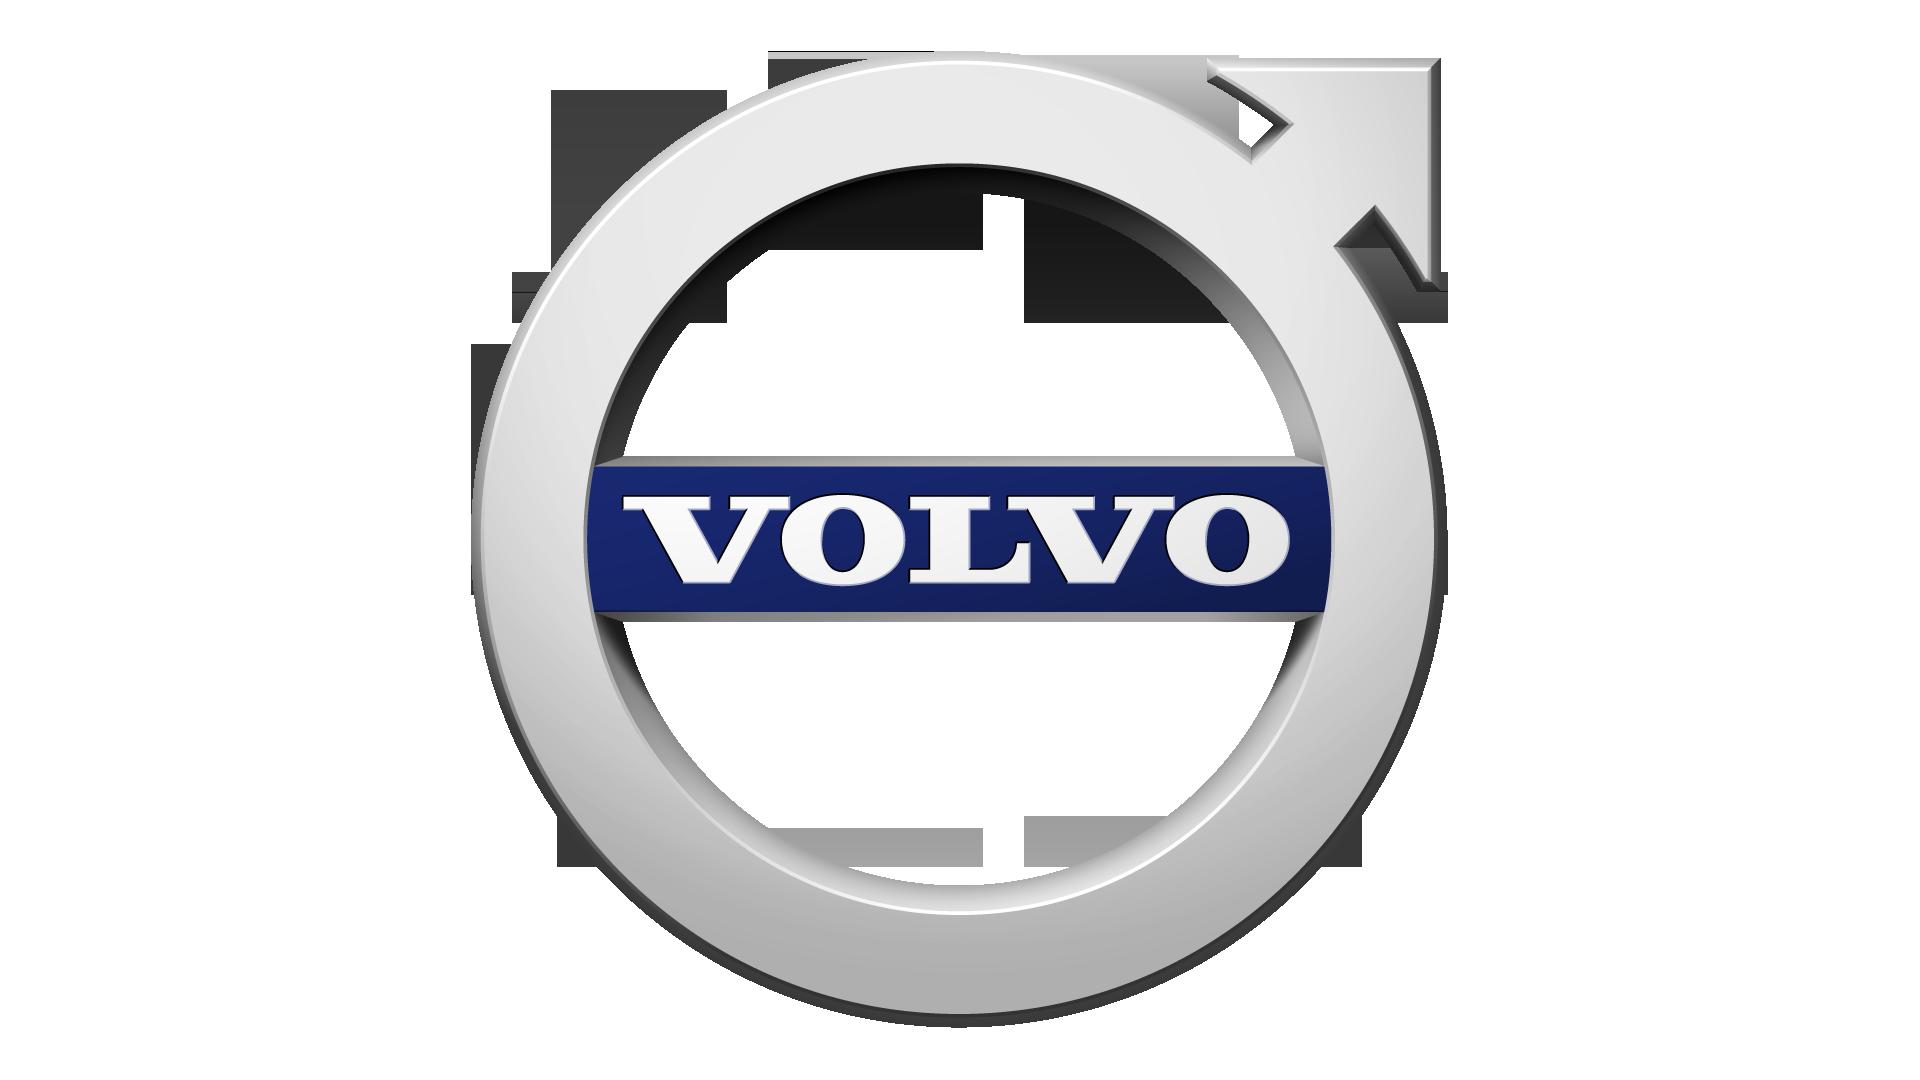 Volvo-logo-2014-1920x1080.png